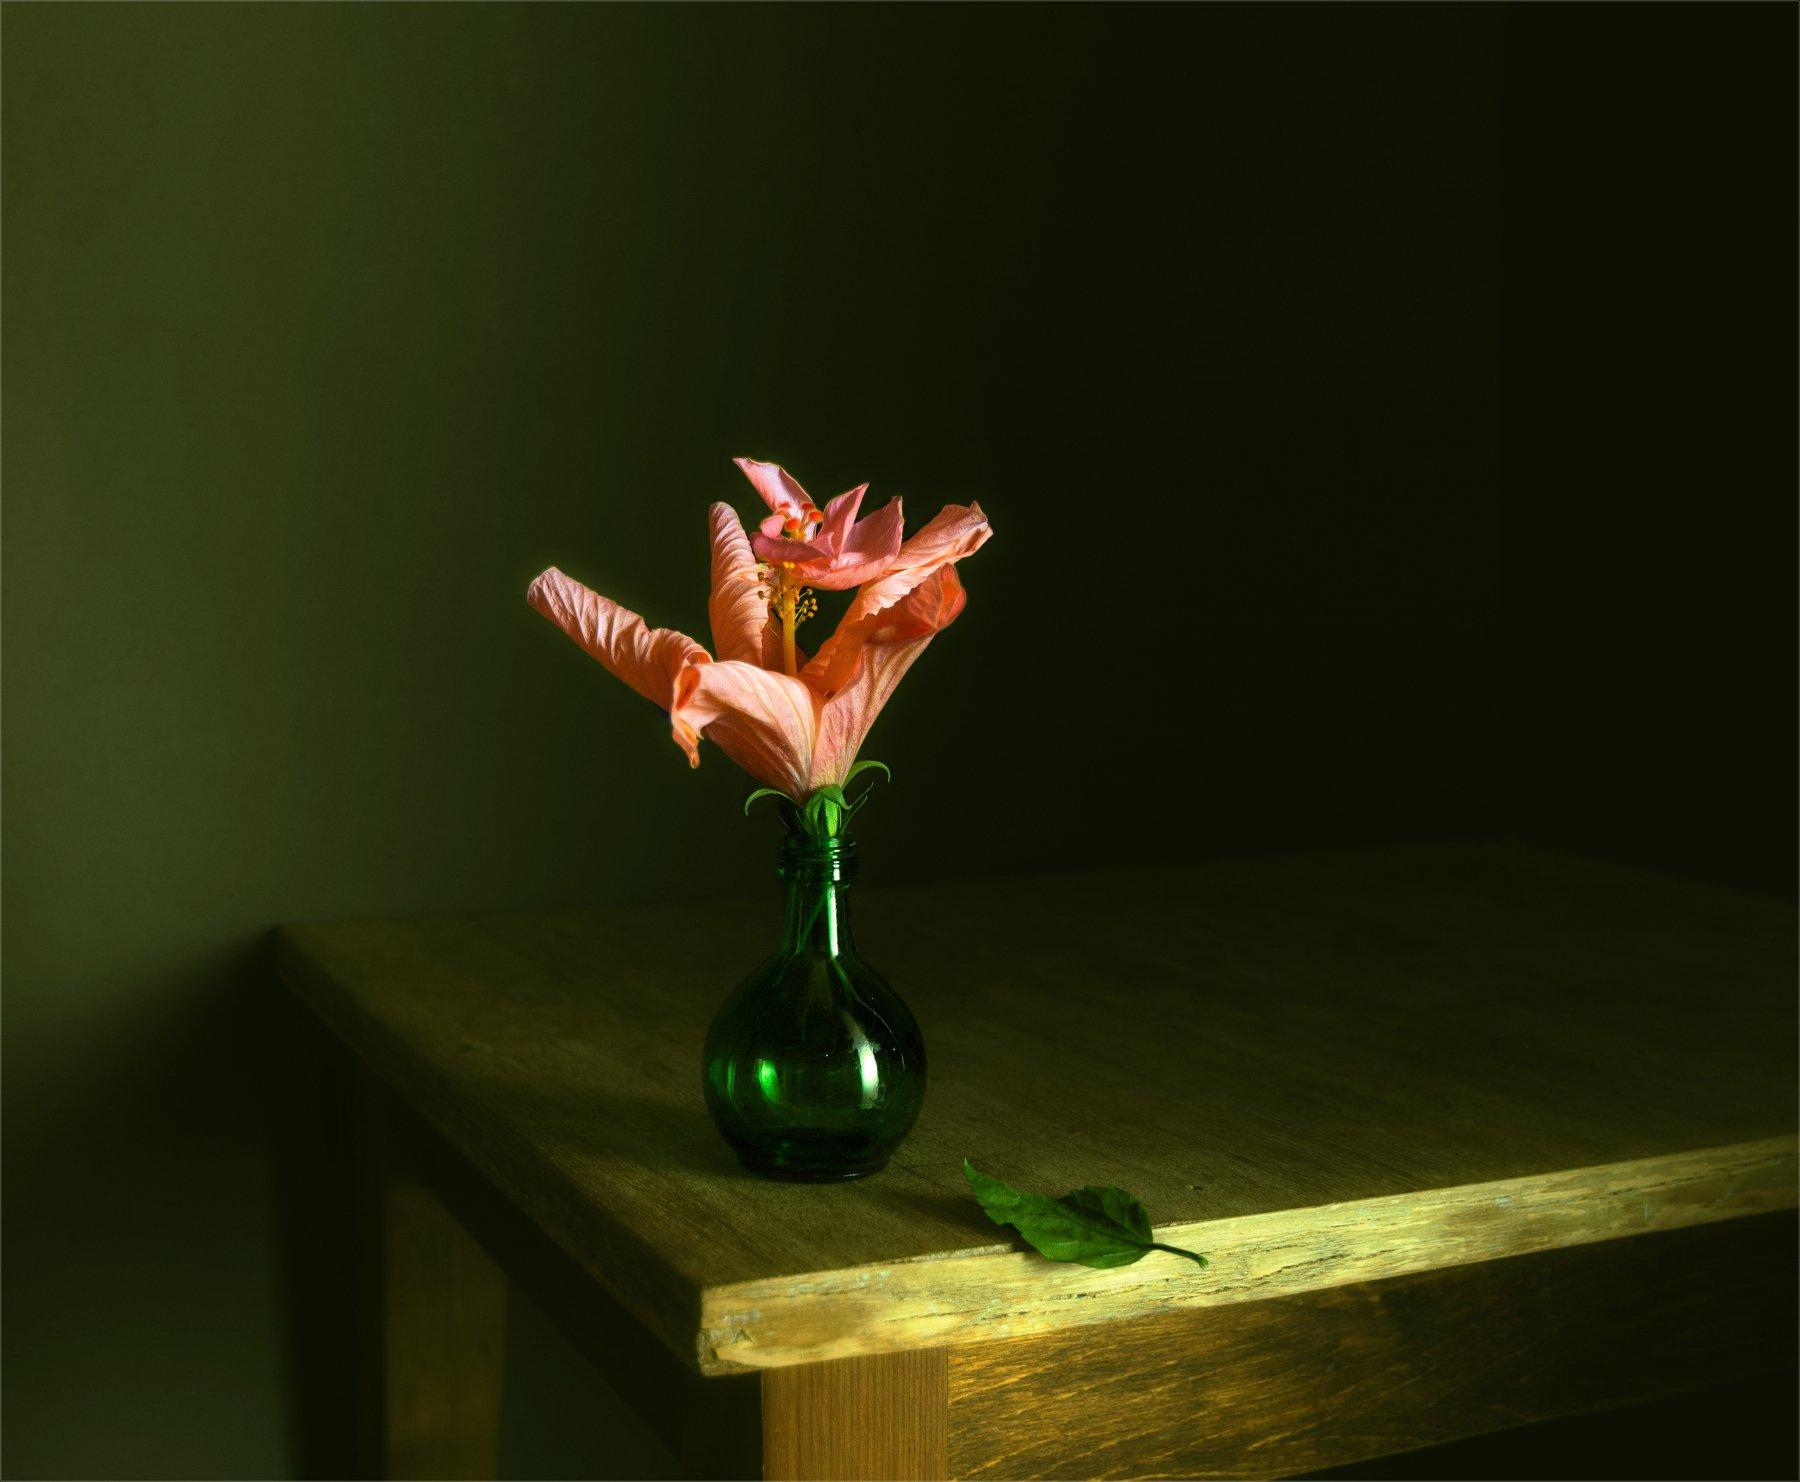 still life, натюрморт,   винтаж,  растение,цветы, гибискус, минимализм, Михаил MSH